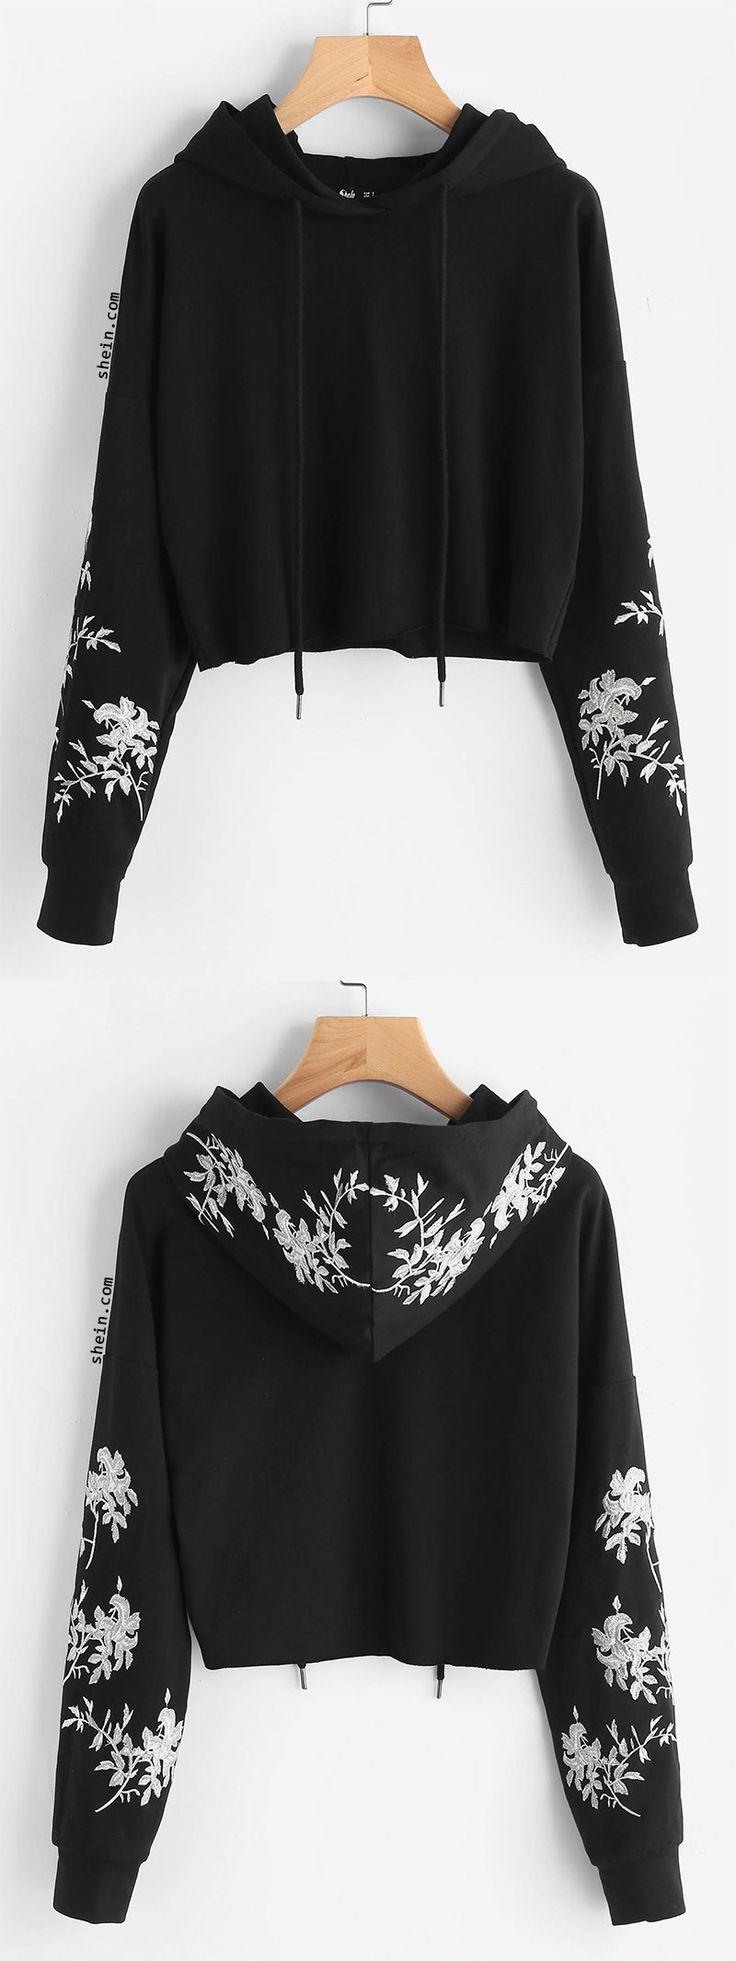 Drop Shoulder Raw Hem Embroidered Hoodie